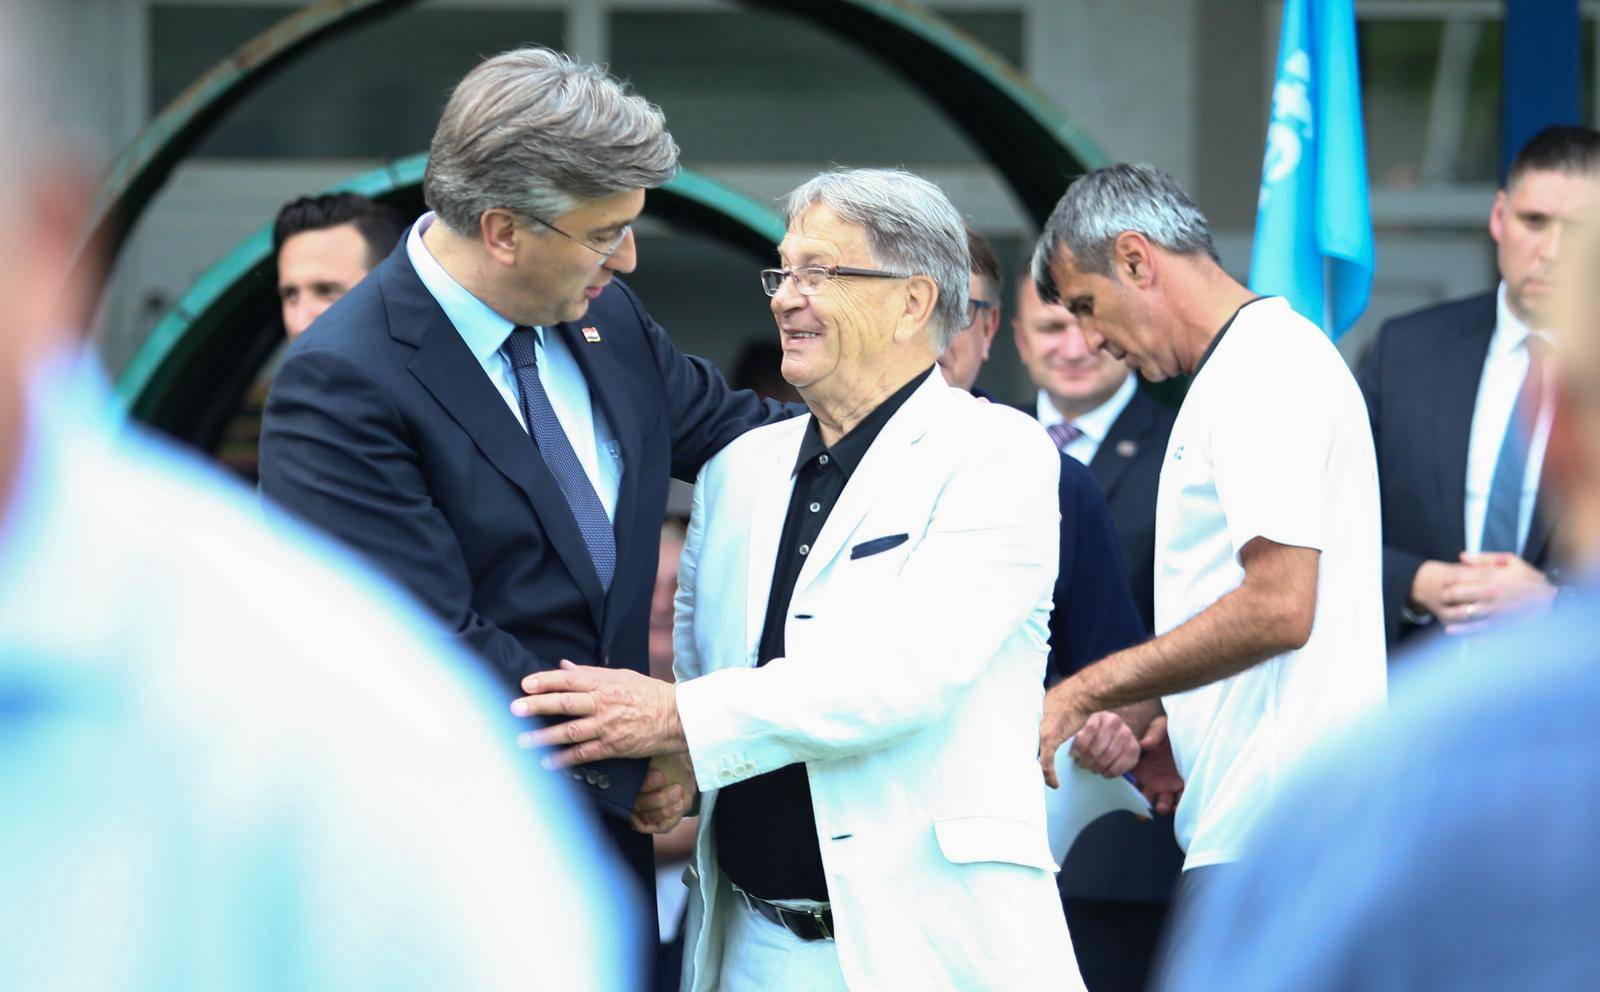 Nakon svečanosti 31. godine osnutka HDZ-a, odigrana i tradicionalna nogometna utakmica